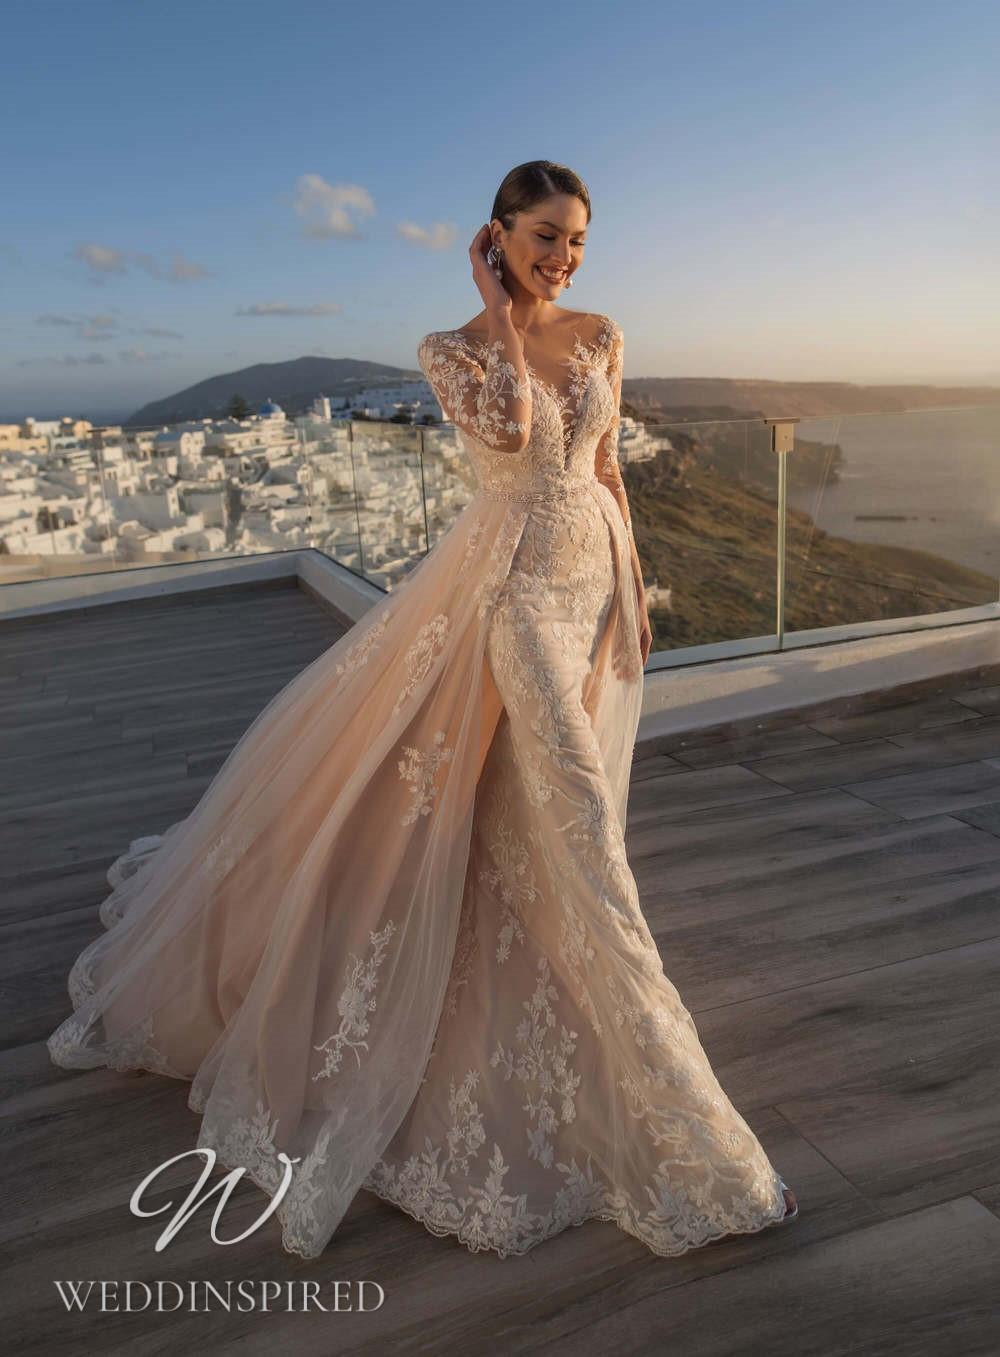 A Blunny 2021 blush lace mermaid wedding dress with a detachable skirt